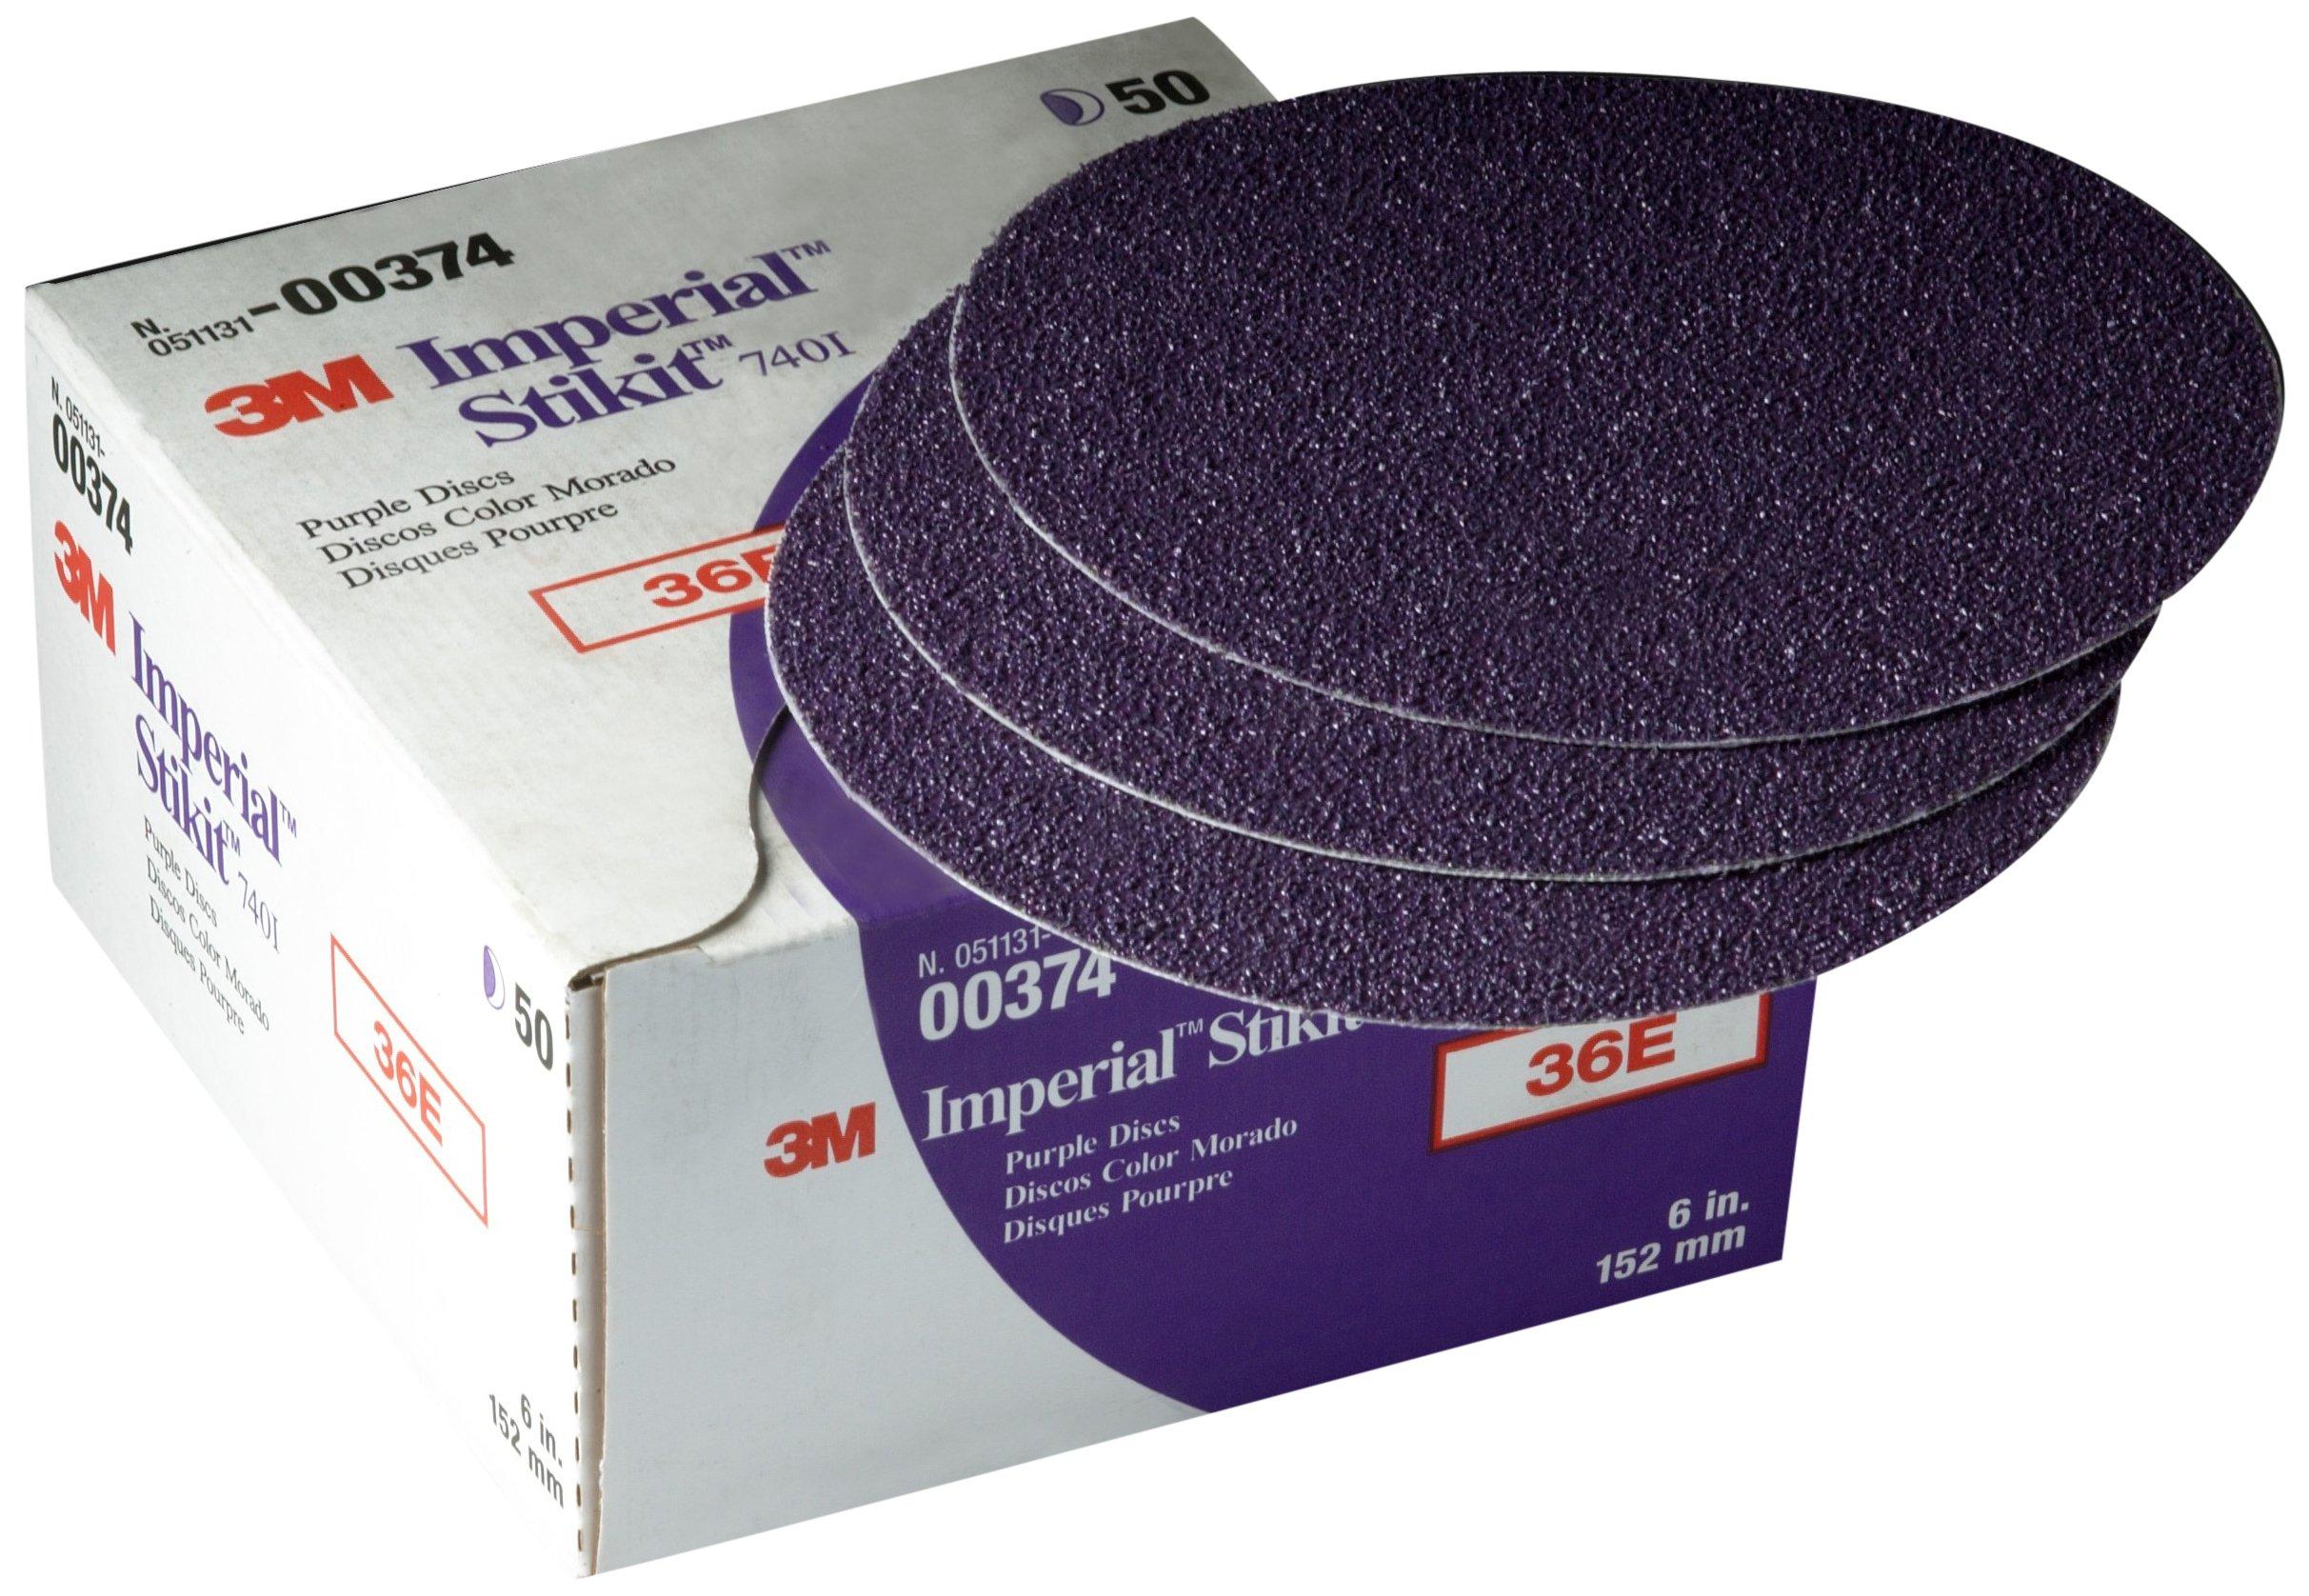 3M 00374 Imperial Stikit 6'' 36E Grit Disc